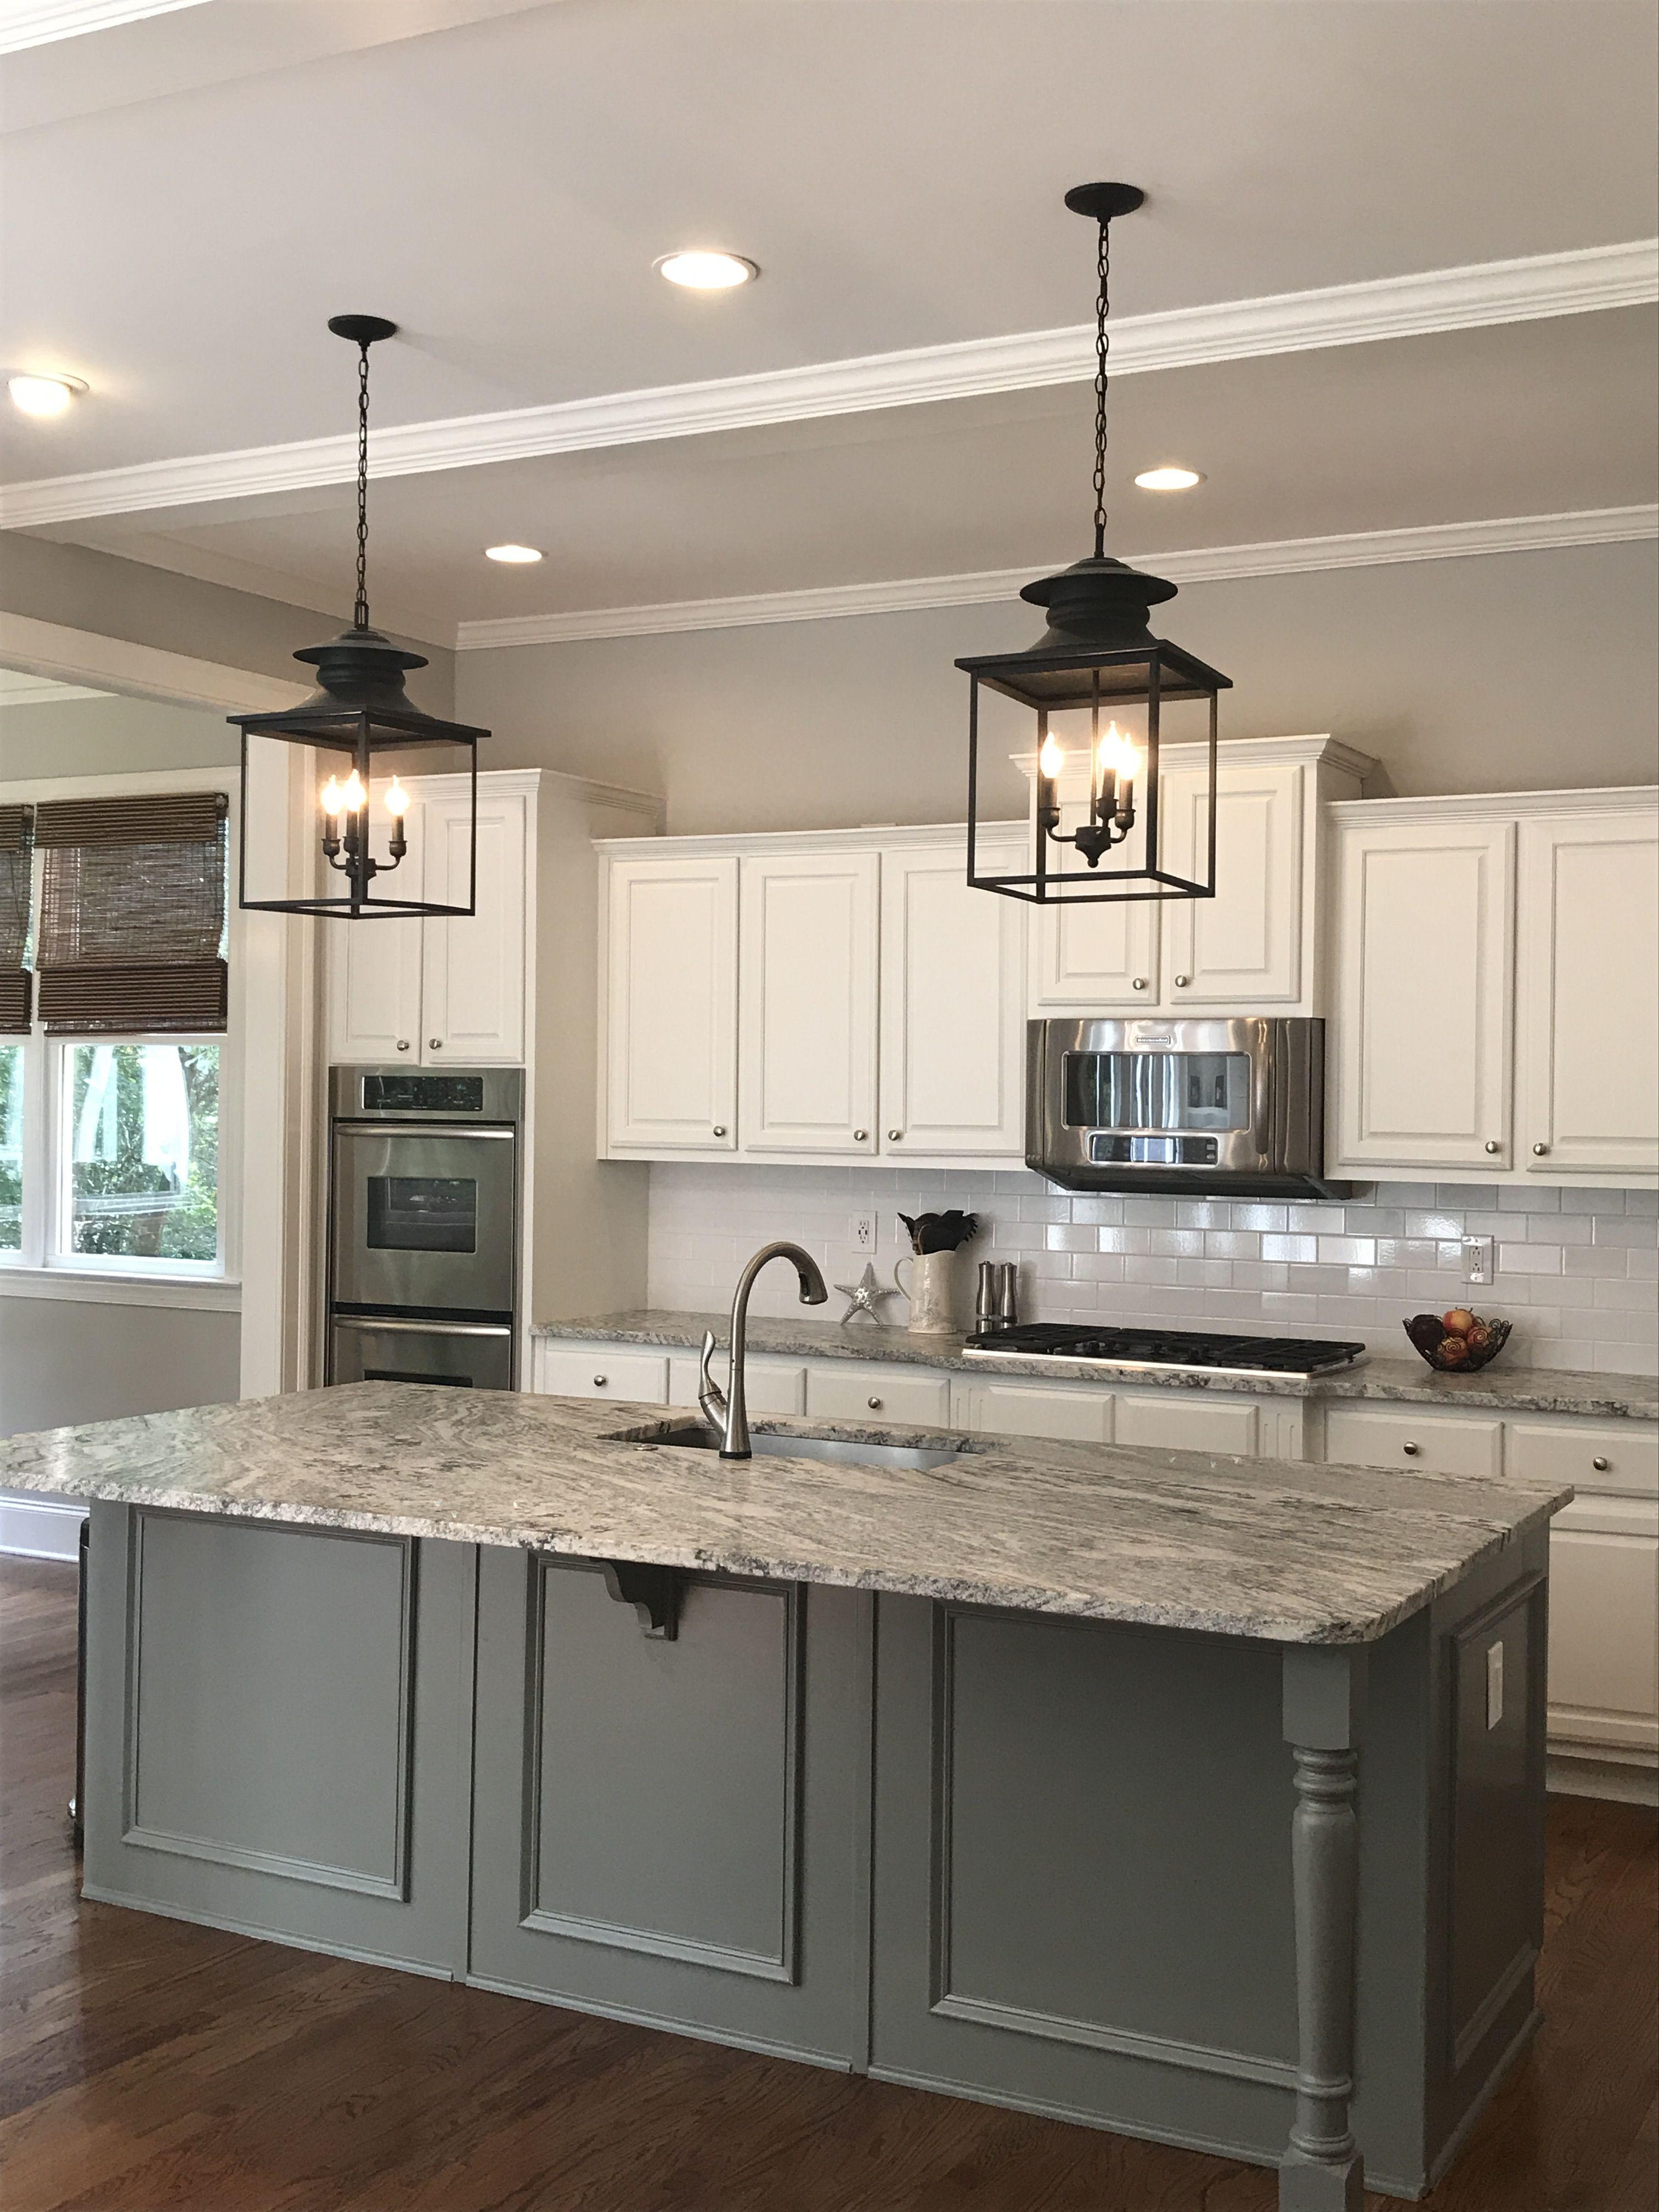 Best Walls Bm Stonington Gray Cabinets Trim Ceiling Bm 400 x 300